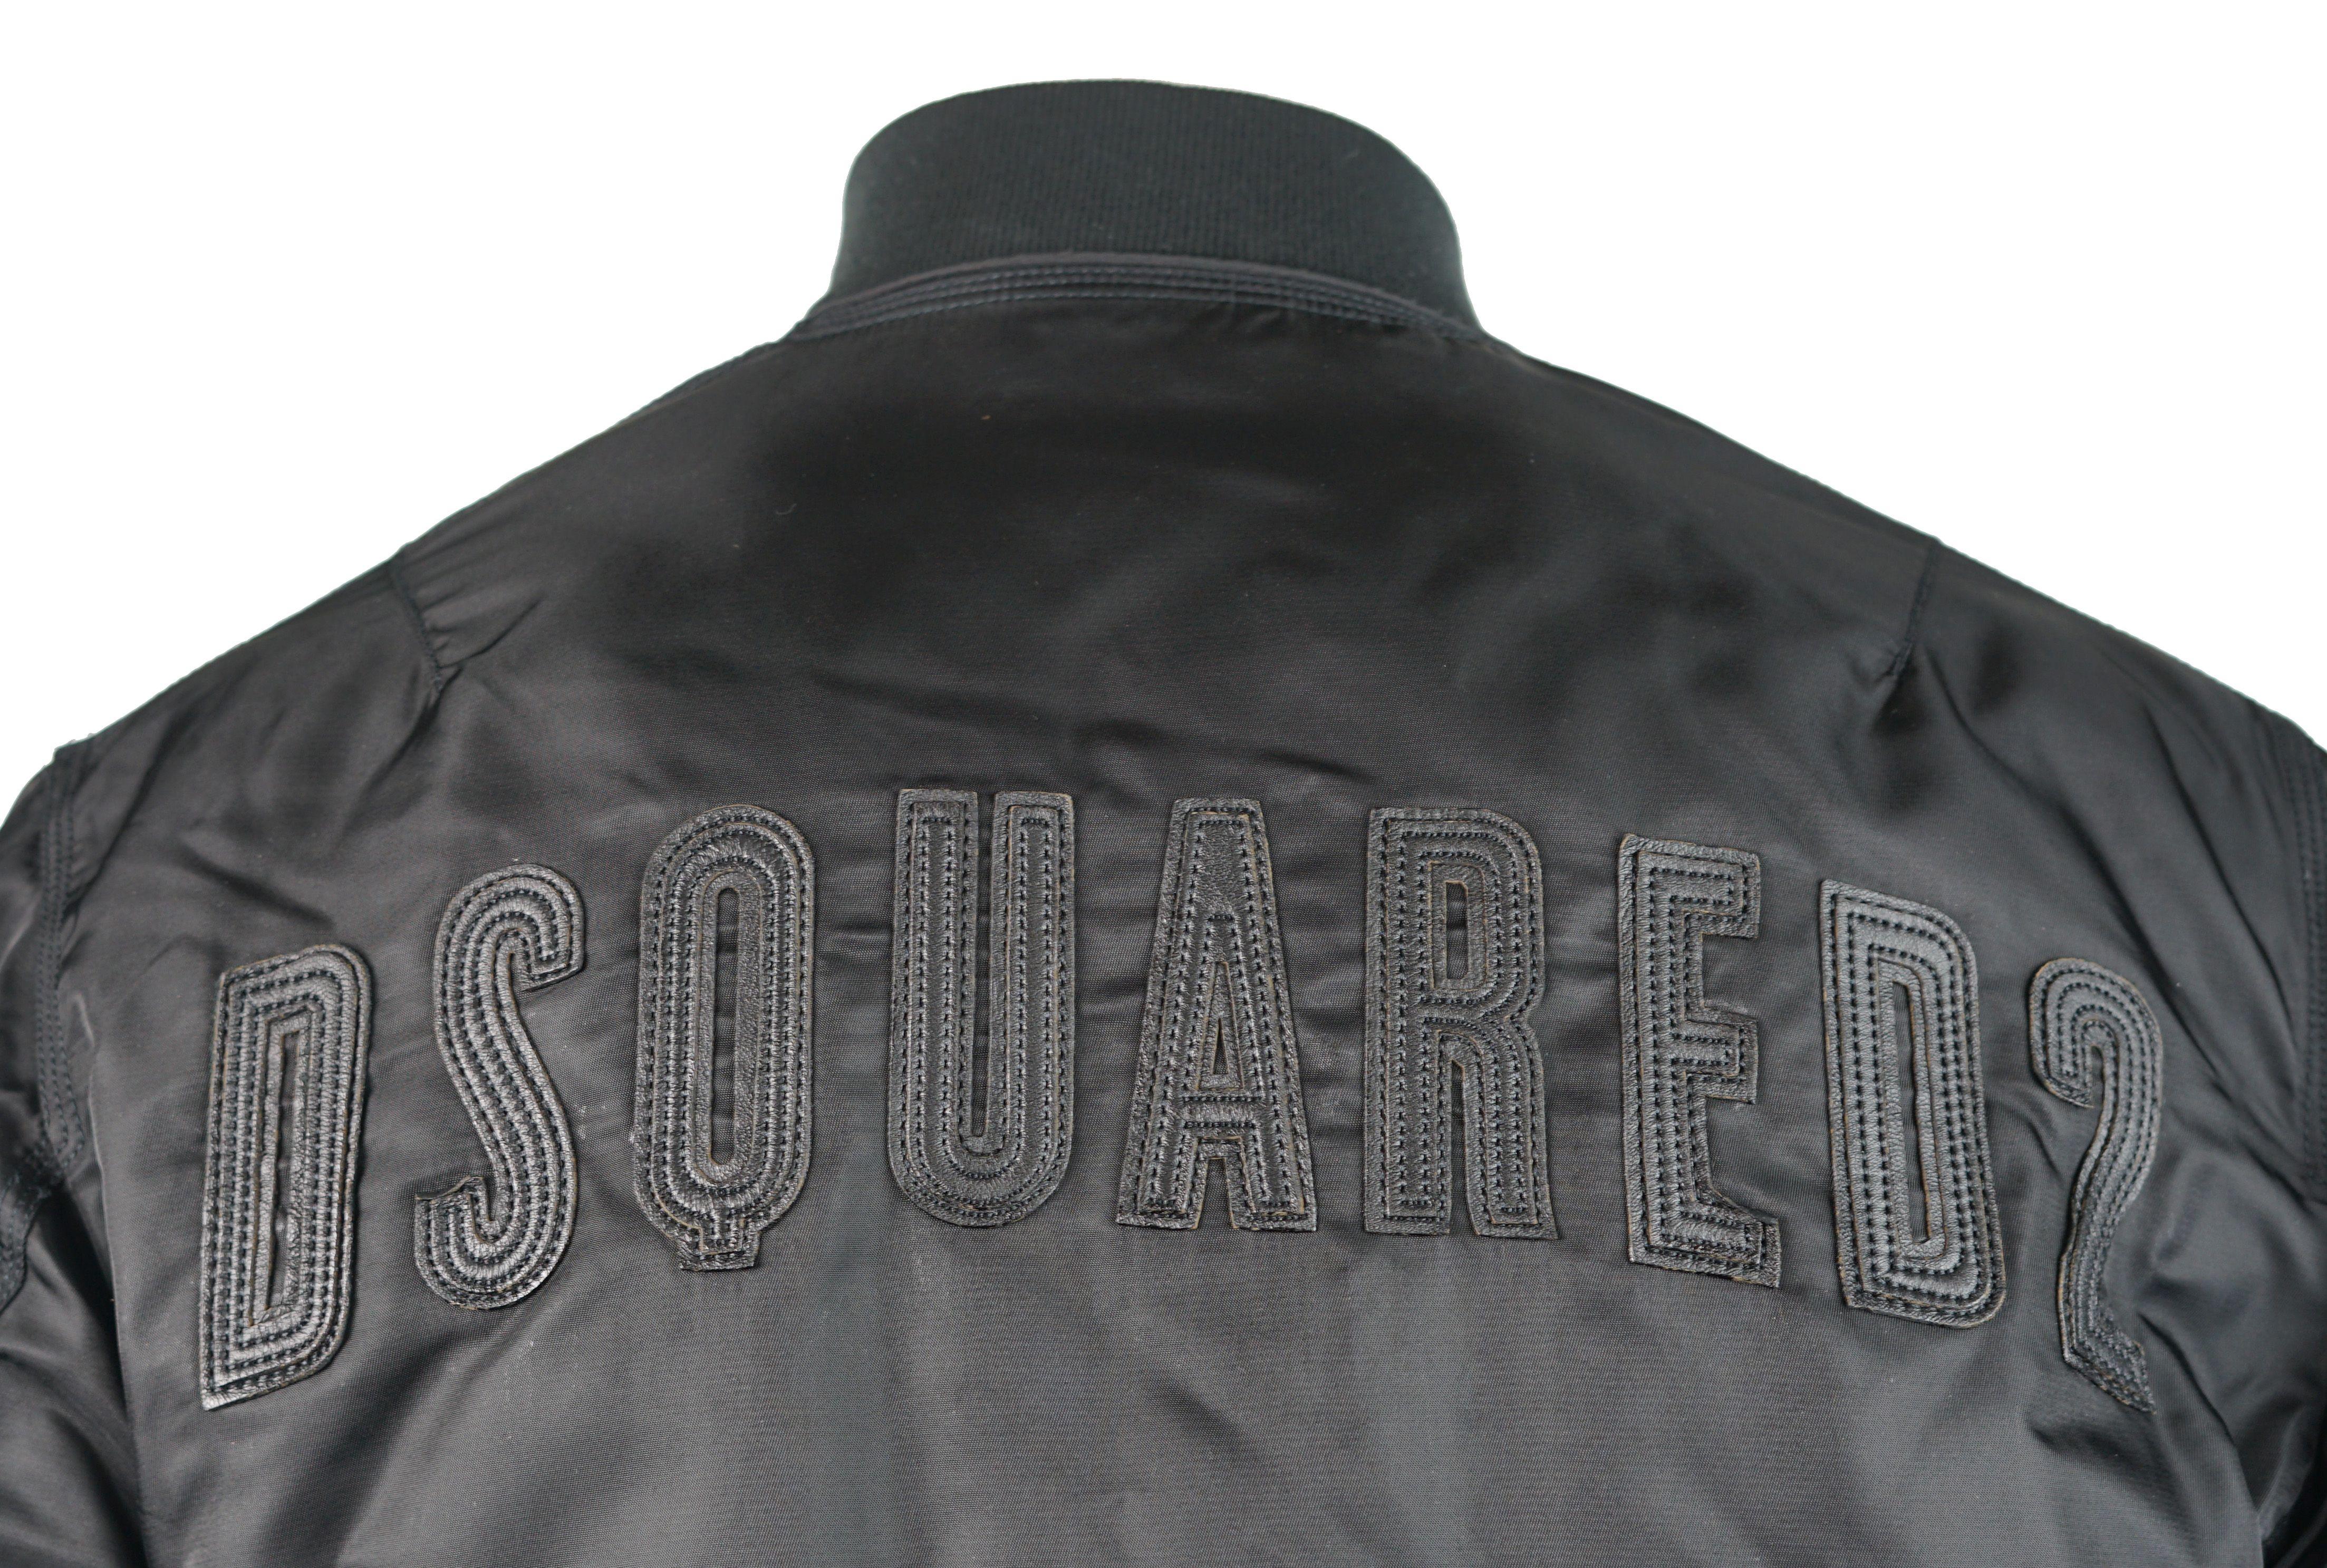 DSquared2 S71AM0985 S49350 900 Jacket